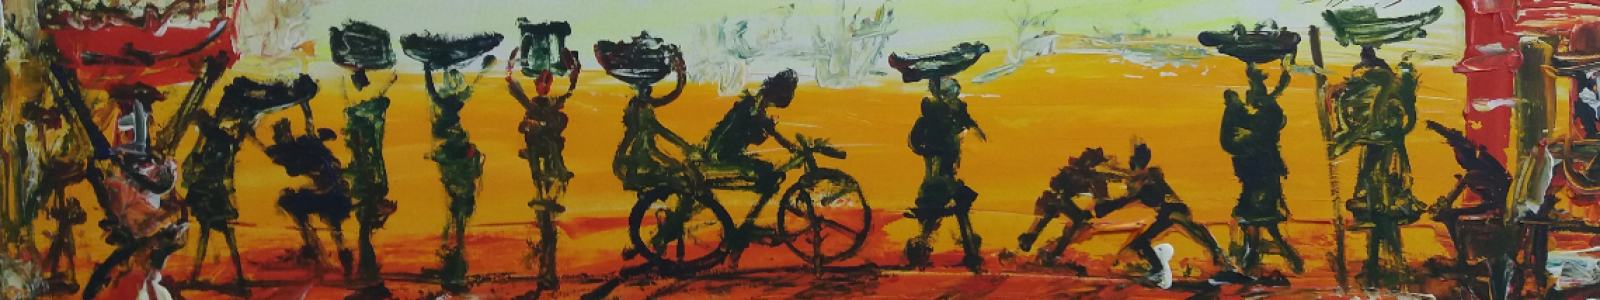 Gallery Painter Bob Usoroh